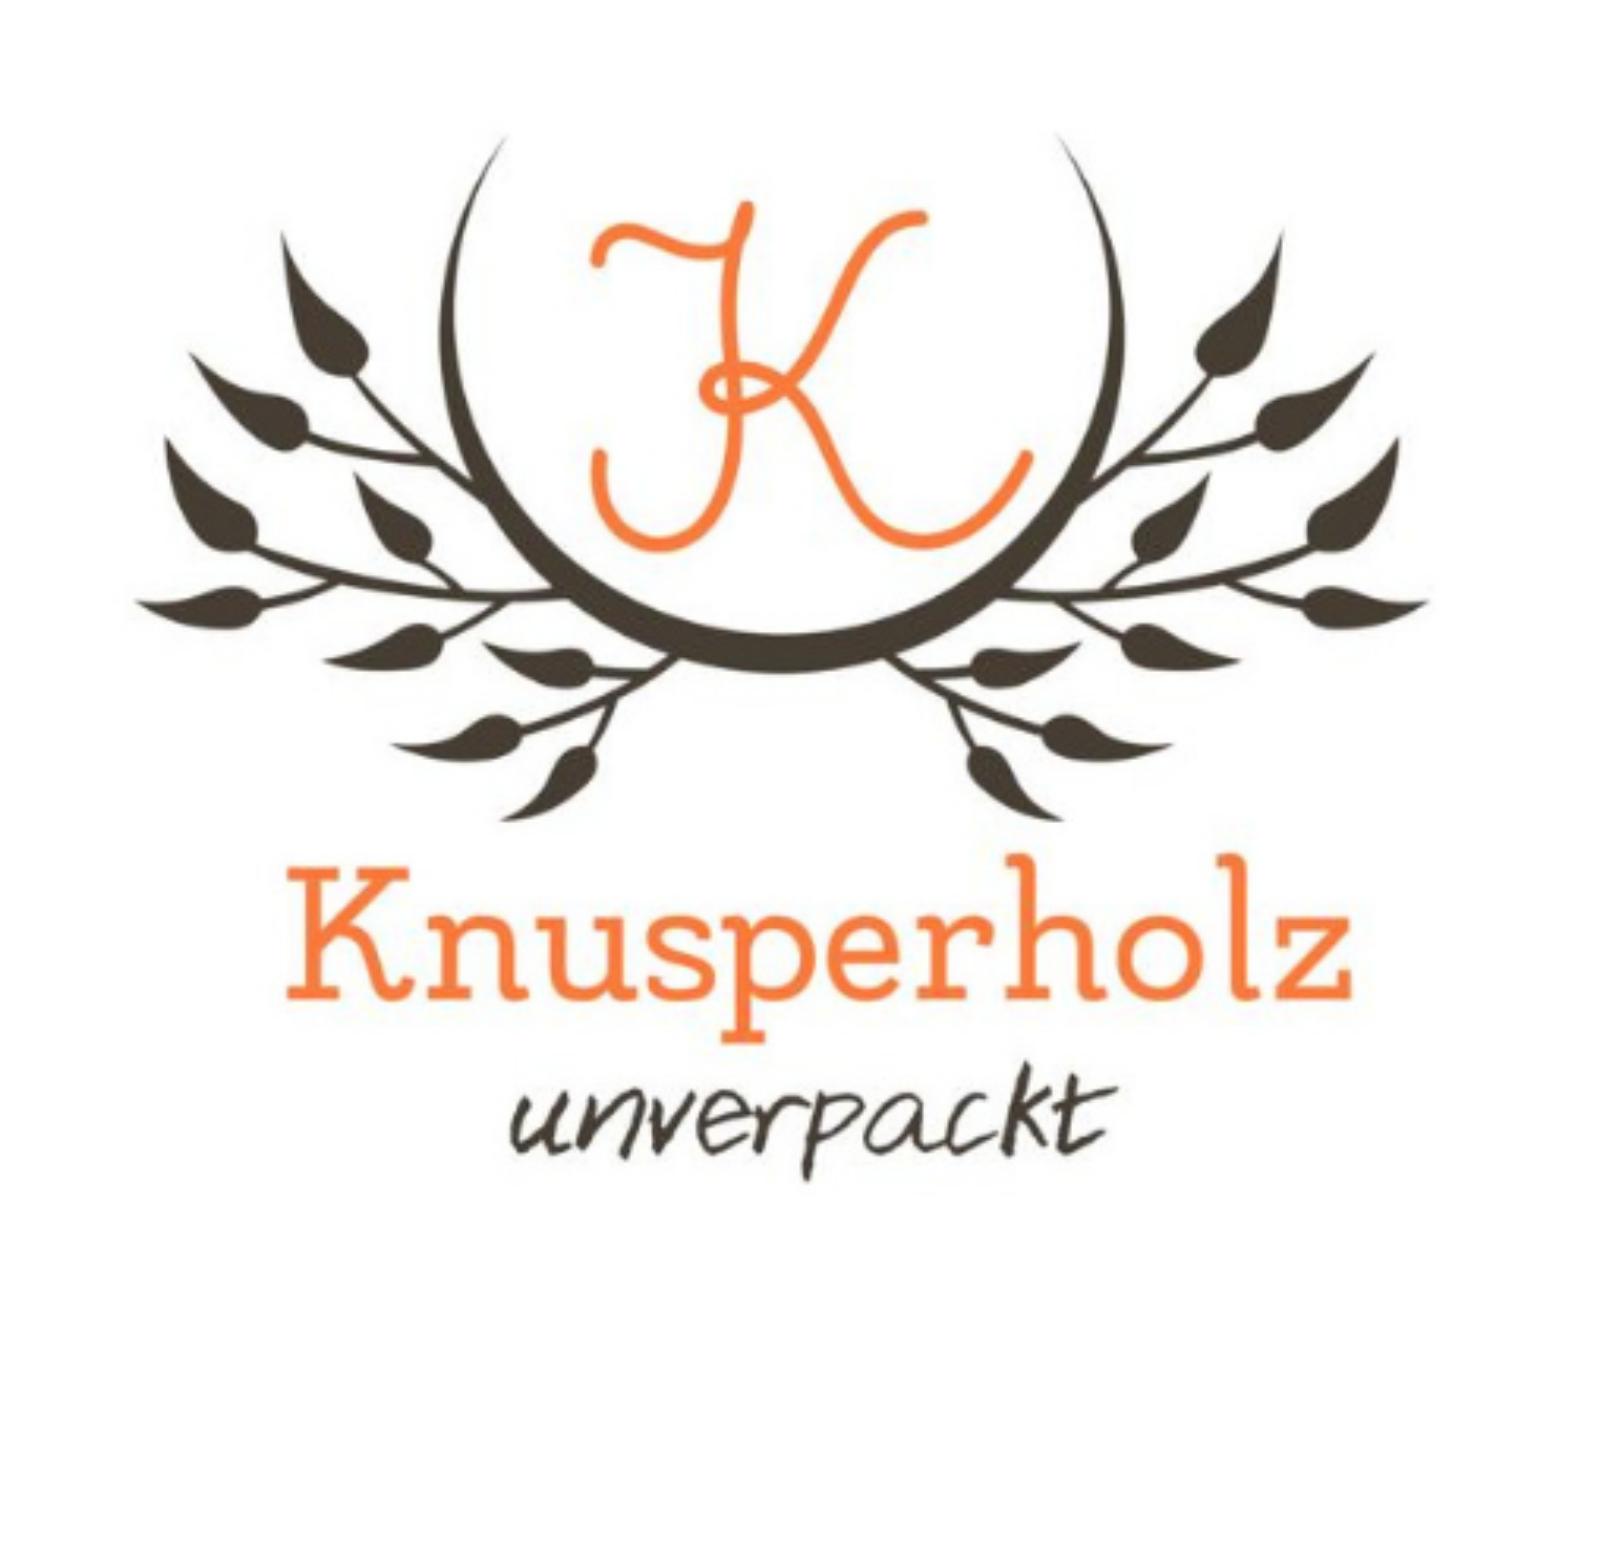 Knusperholz